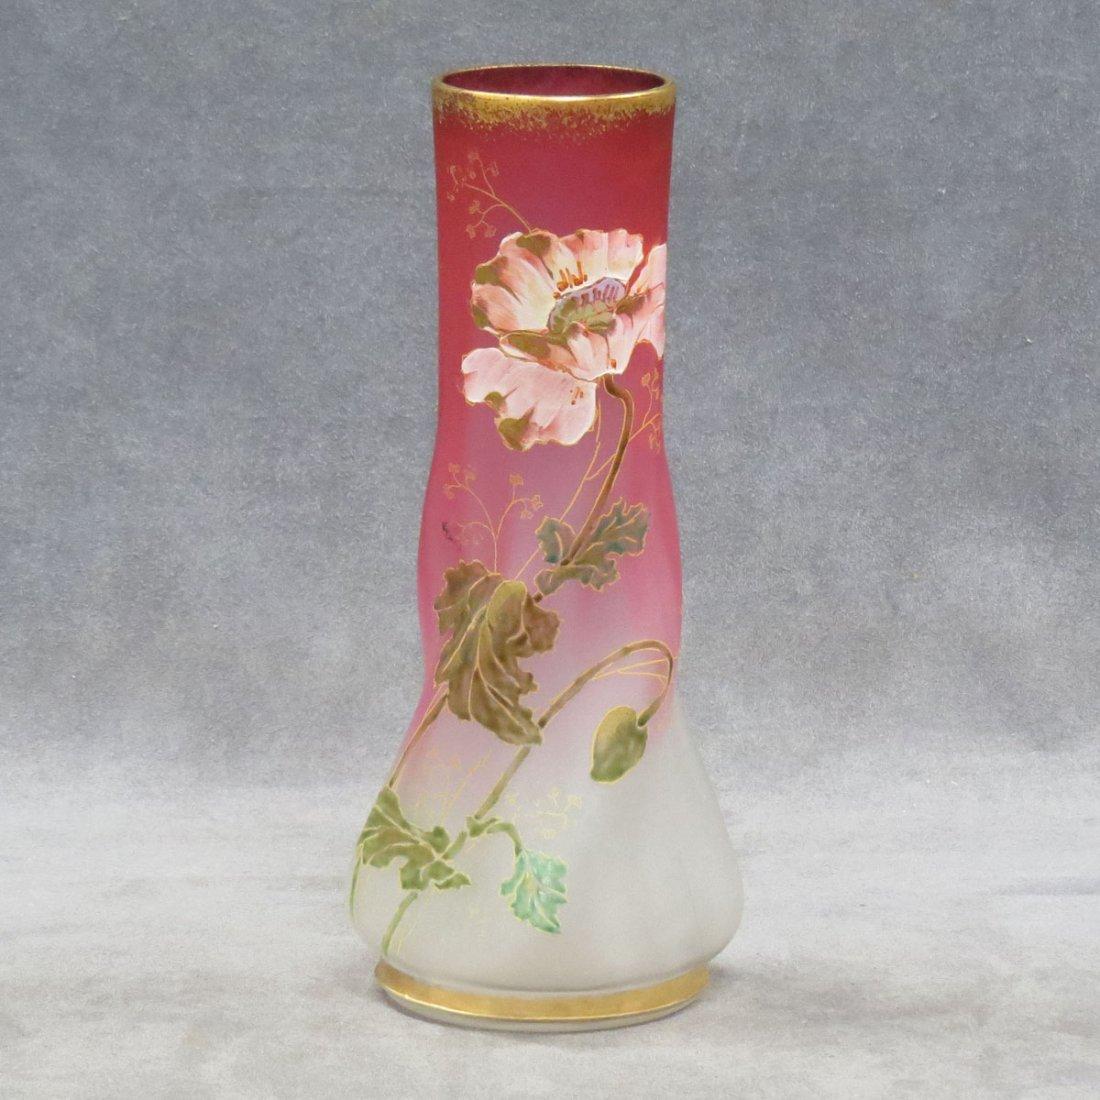 VICTORIAN CRANBERRY/SATIN GLASS DECORATED VASE